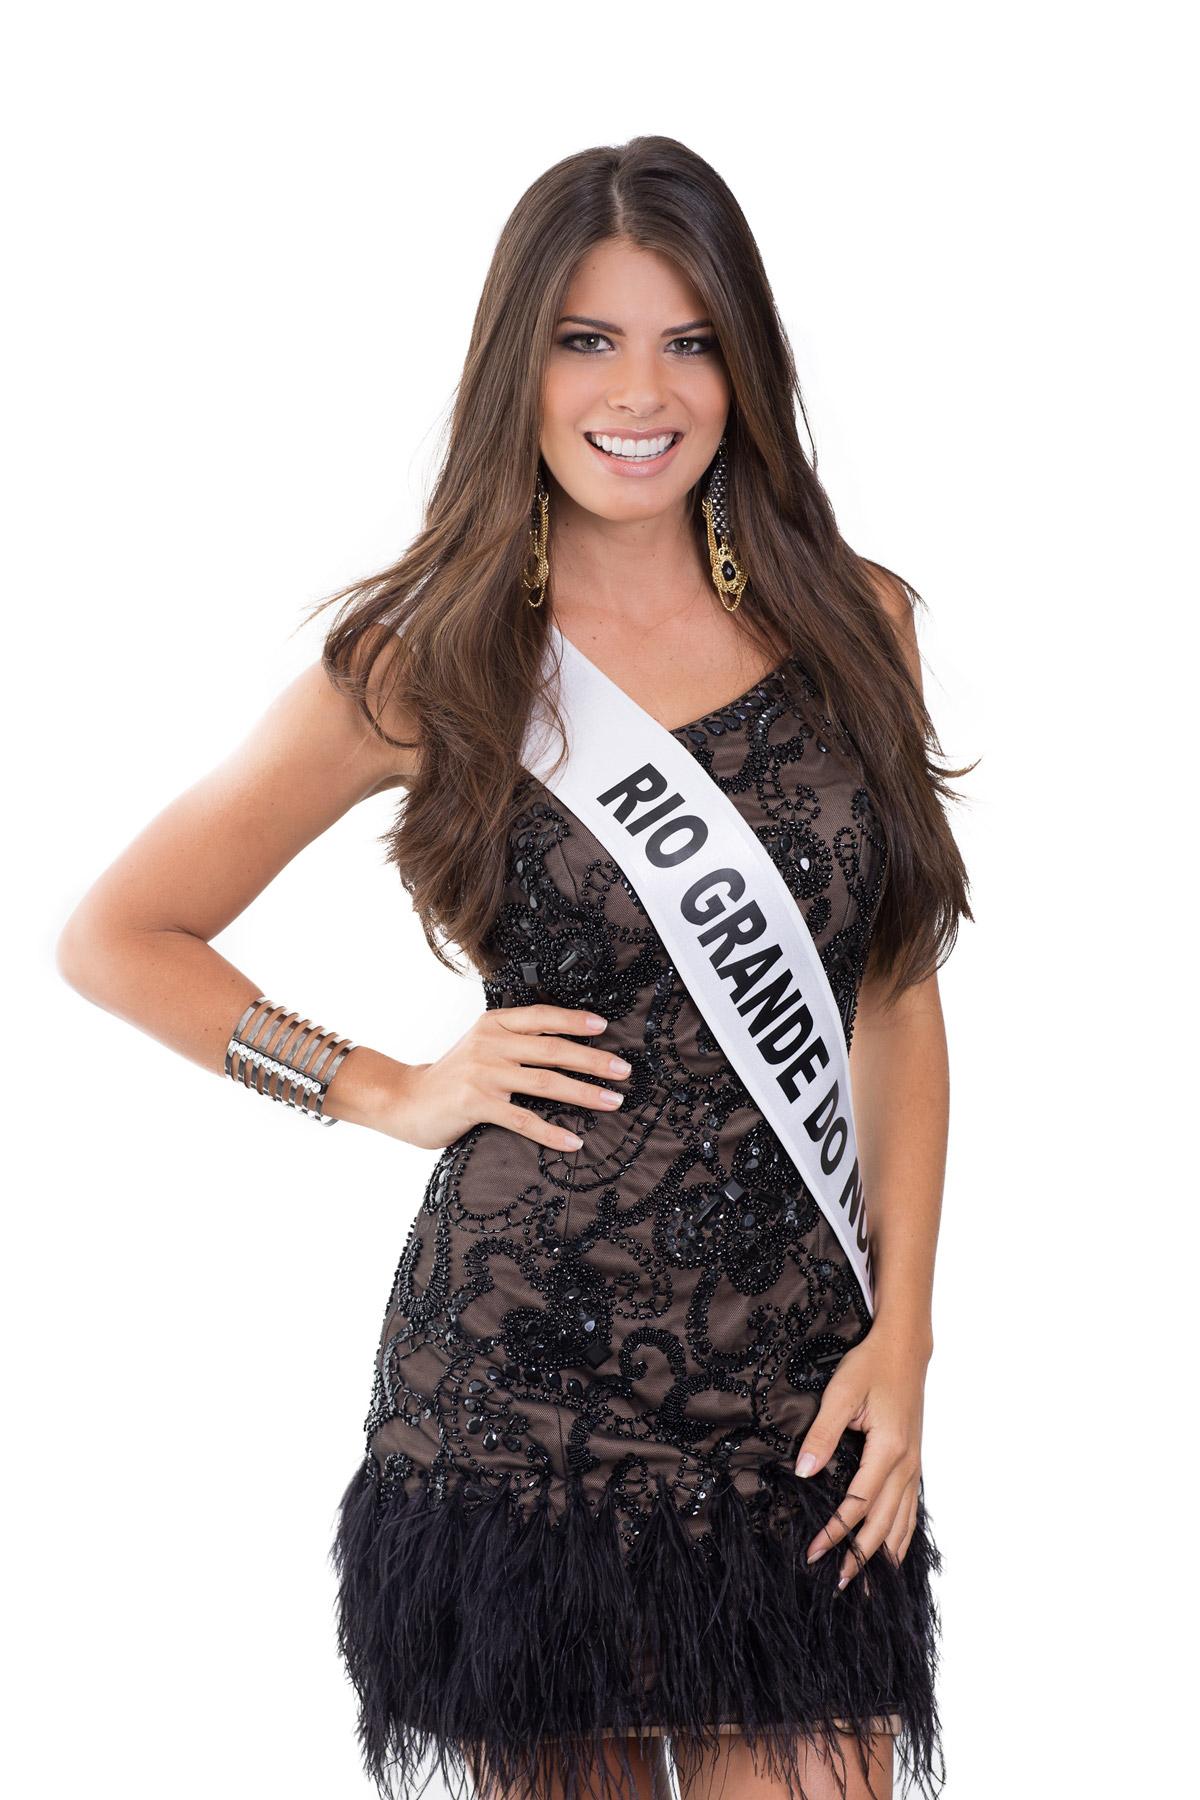 cristina alves, miss brasil internacional 2013. Tpxizz56